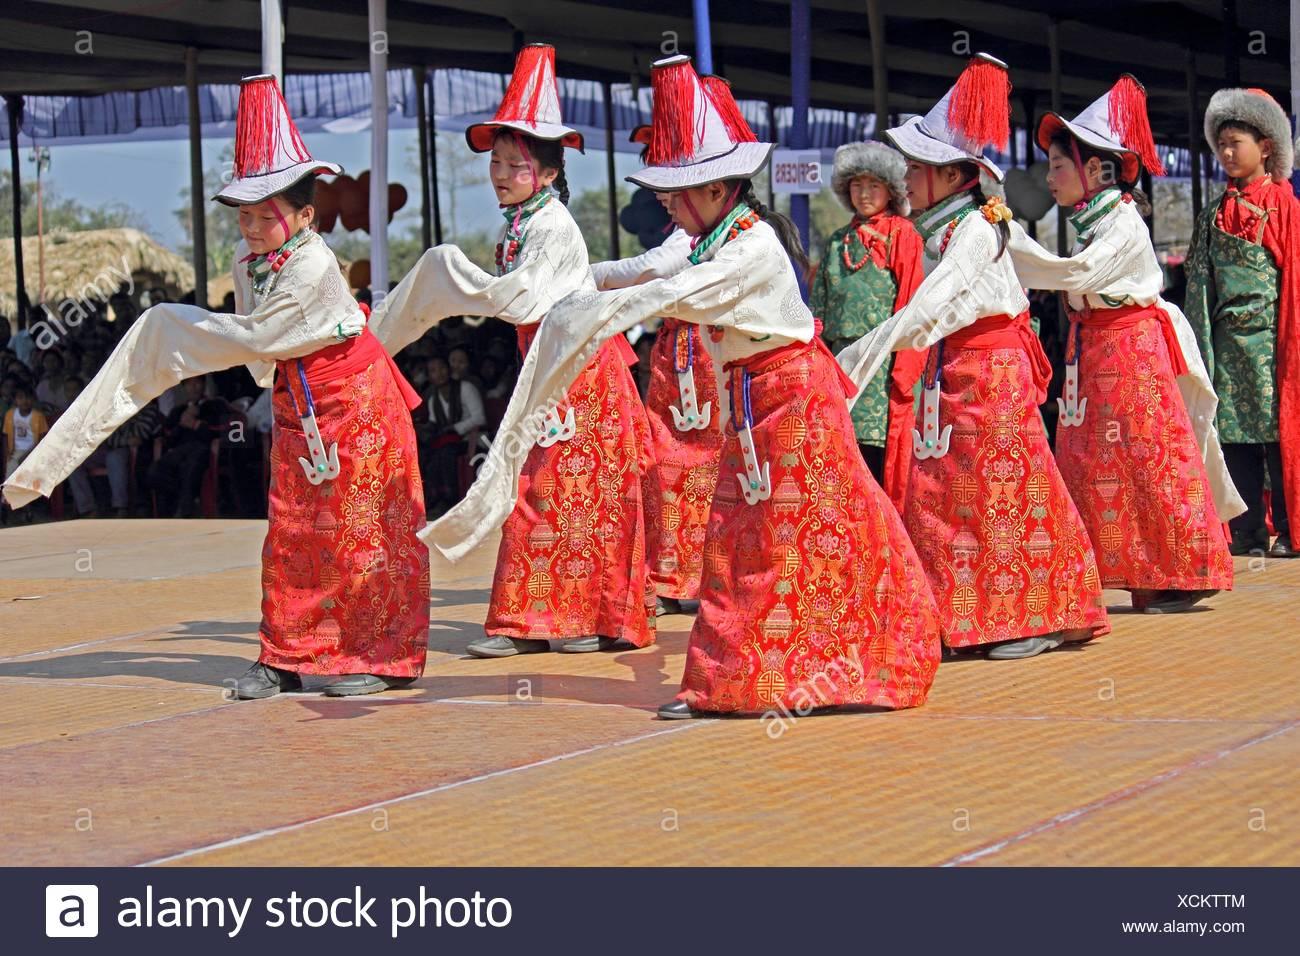 Tibetan performing folk sleeve dance traditional minority at Namdapha Eco Cultural Festival, Miao, Arunachal Pradesh, India - Stock Image